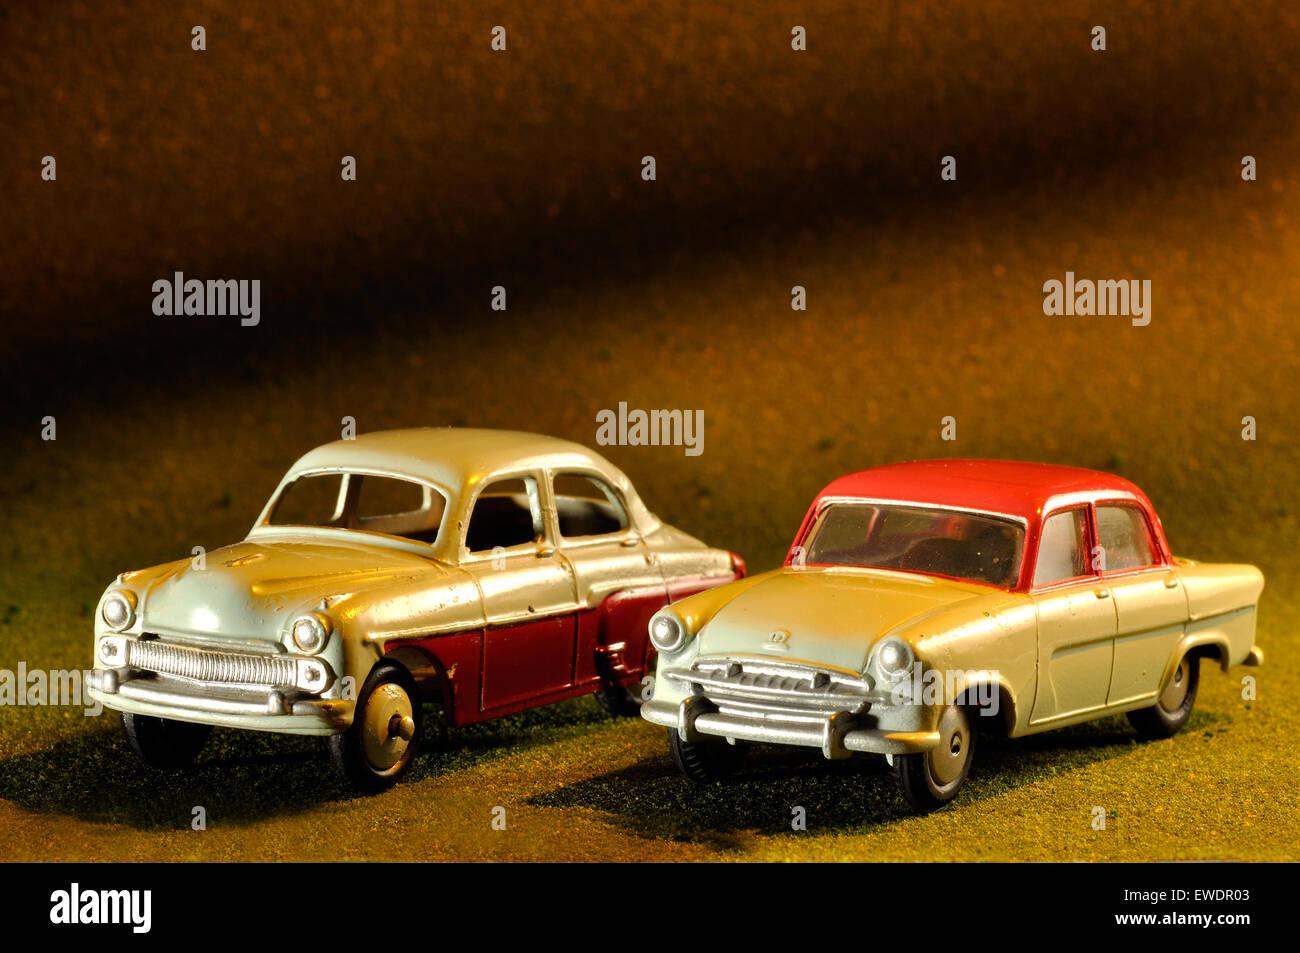 Model Vauxhall Cresta and Standard Vanguard 111 sedan cars in ...